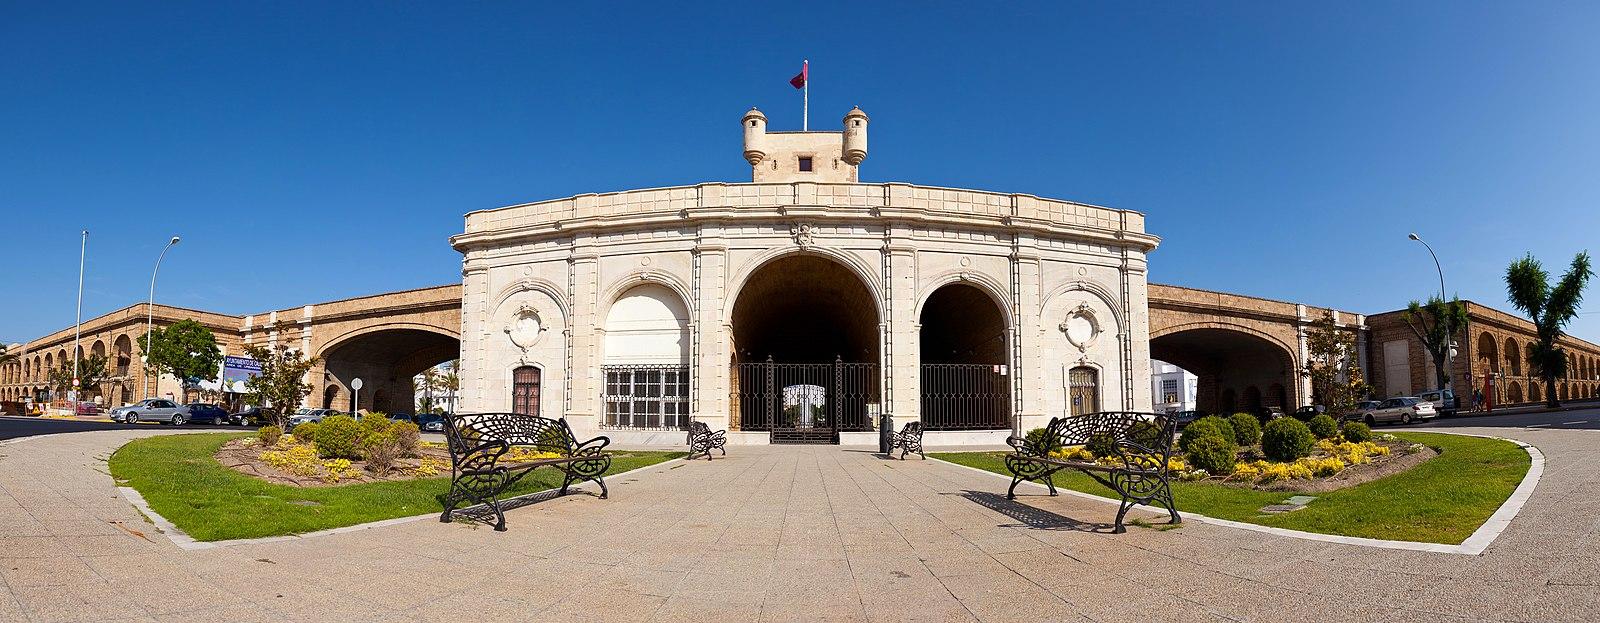 Cádiz, una ciudad llena de historia